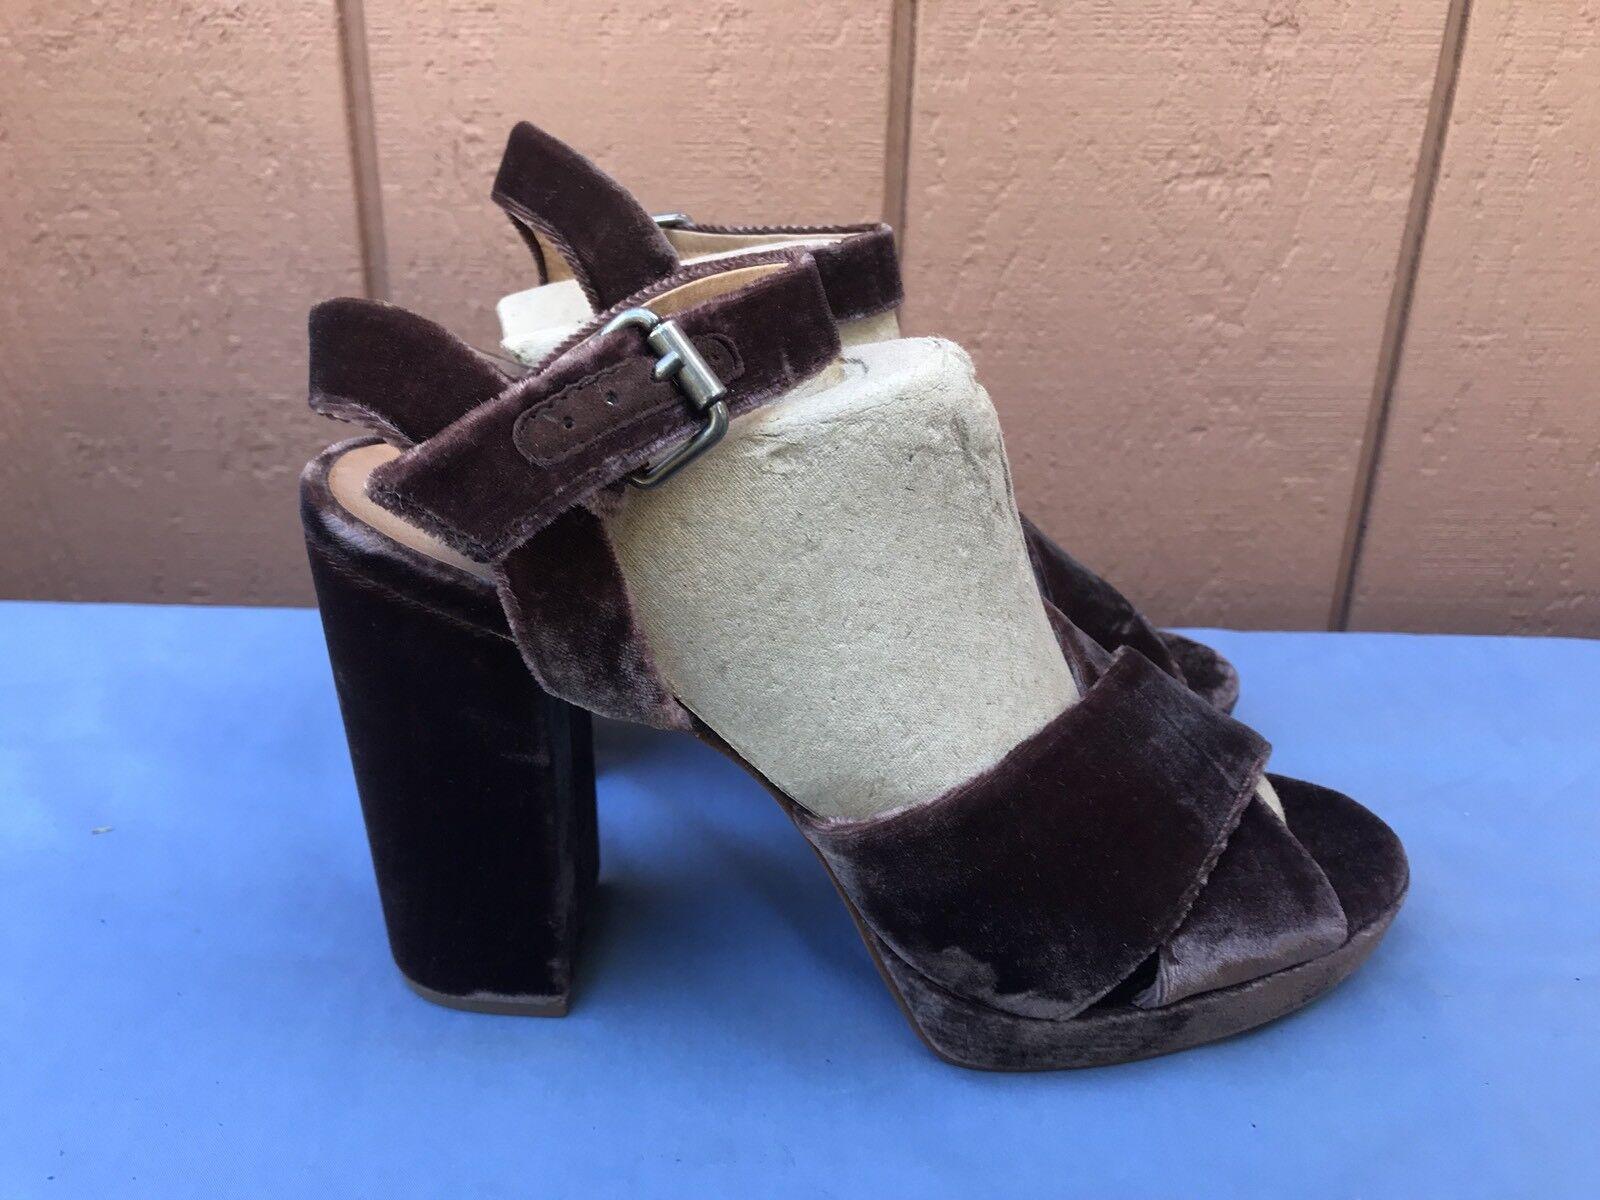 Madewell The Vanessa US 9.5 Criss Cross Wine Sandale Schuhe Heel Braun Wine Cross Velvet A7 8d8149